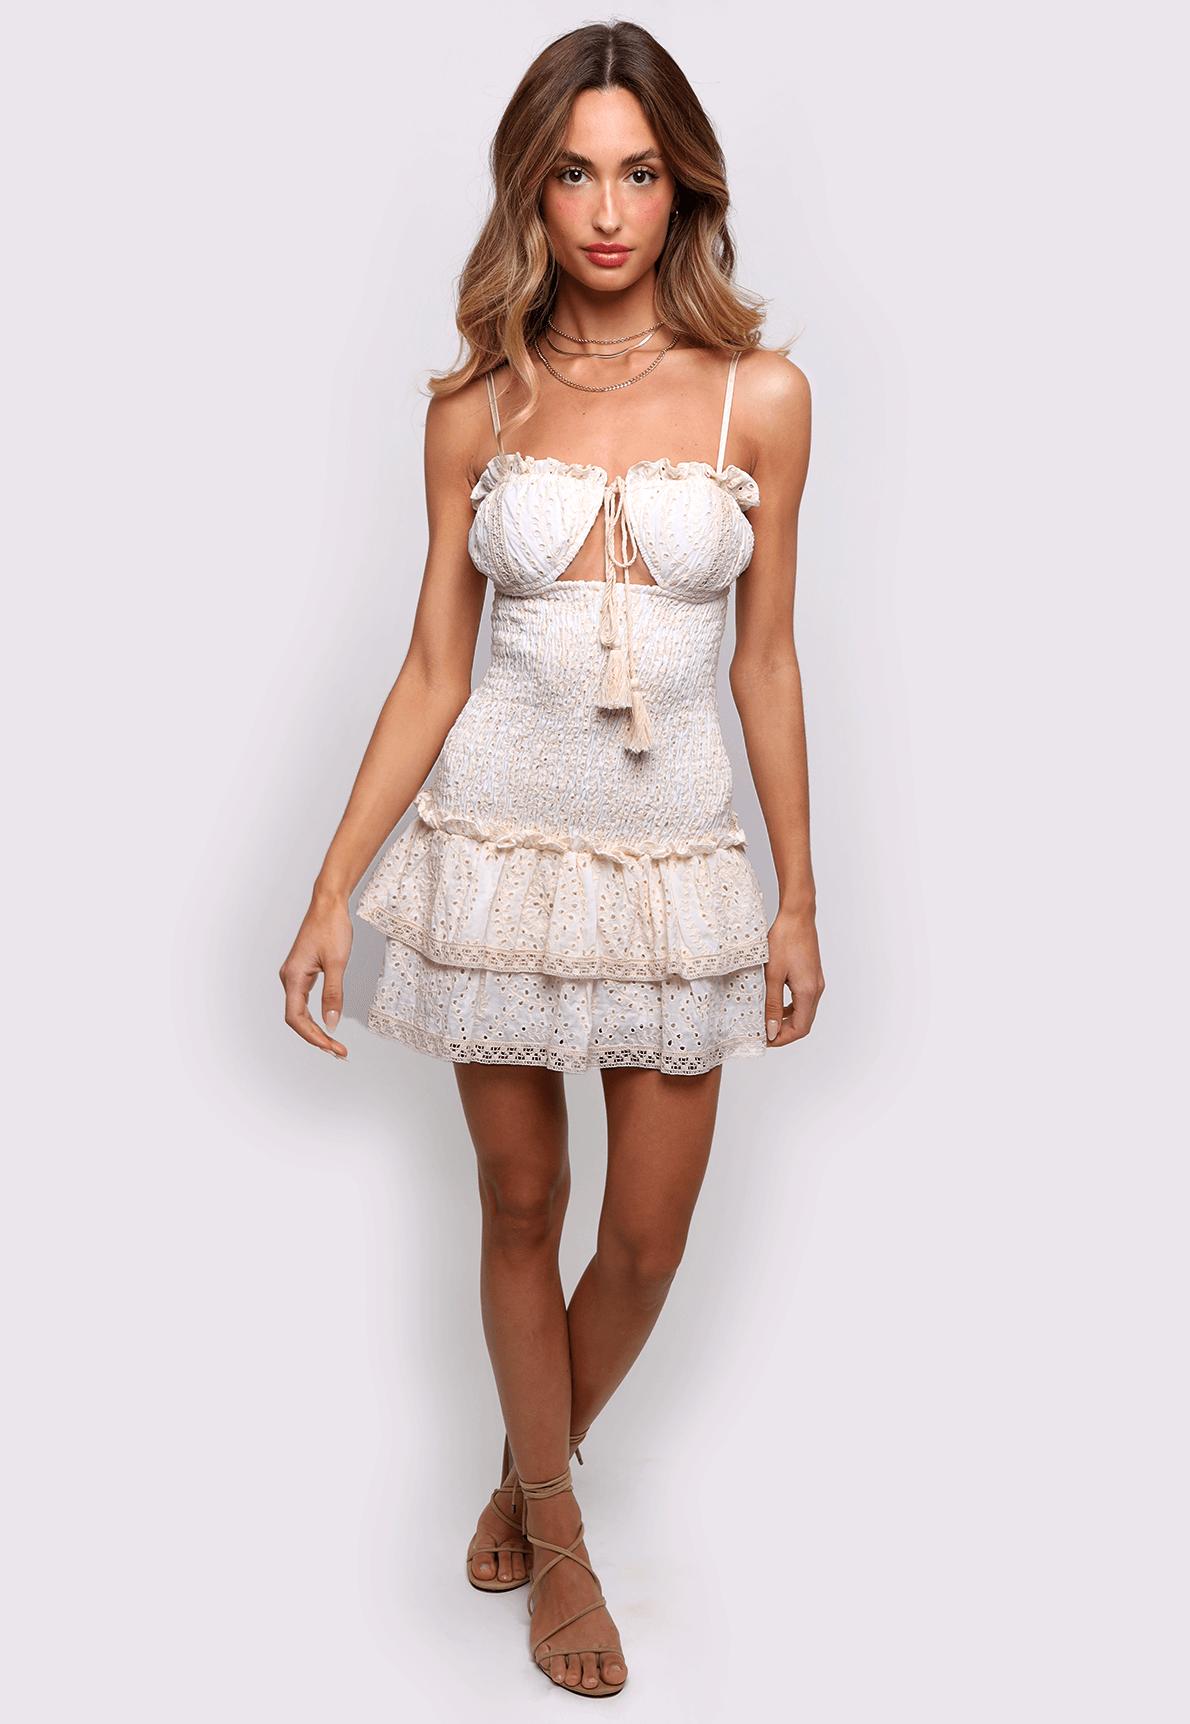 36618-vestido-pe-na-areia-bege-mundo-lolita-01